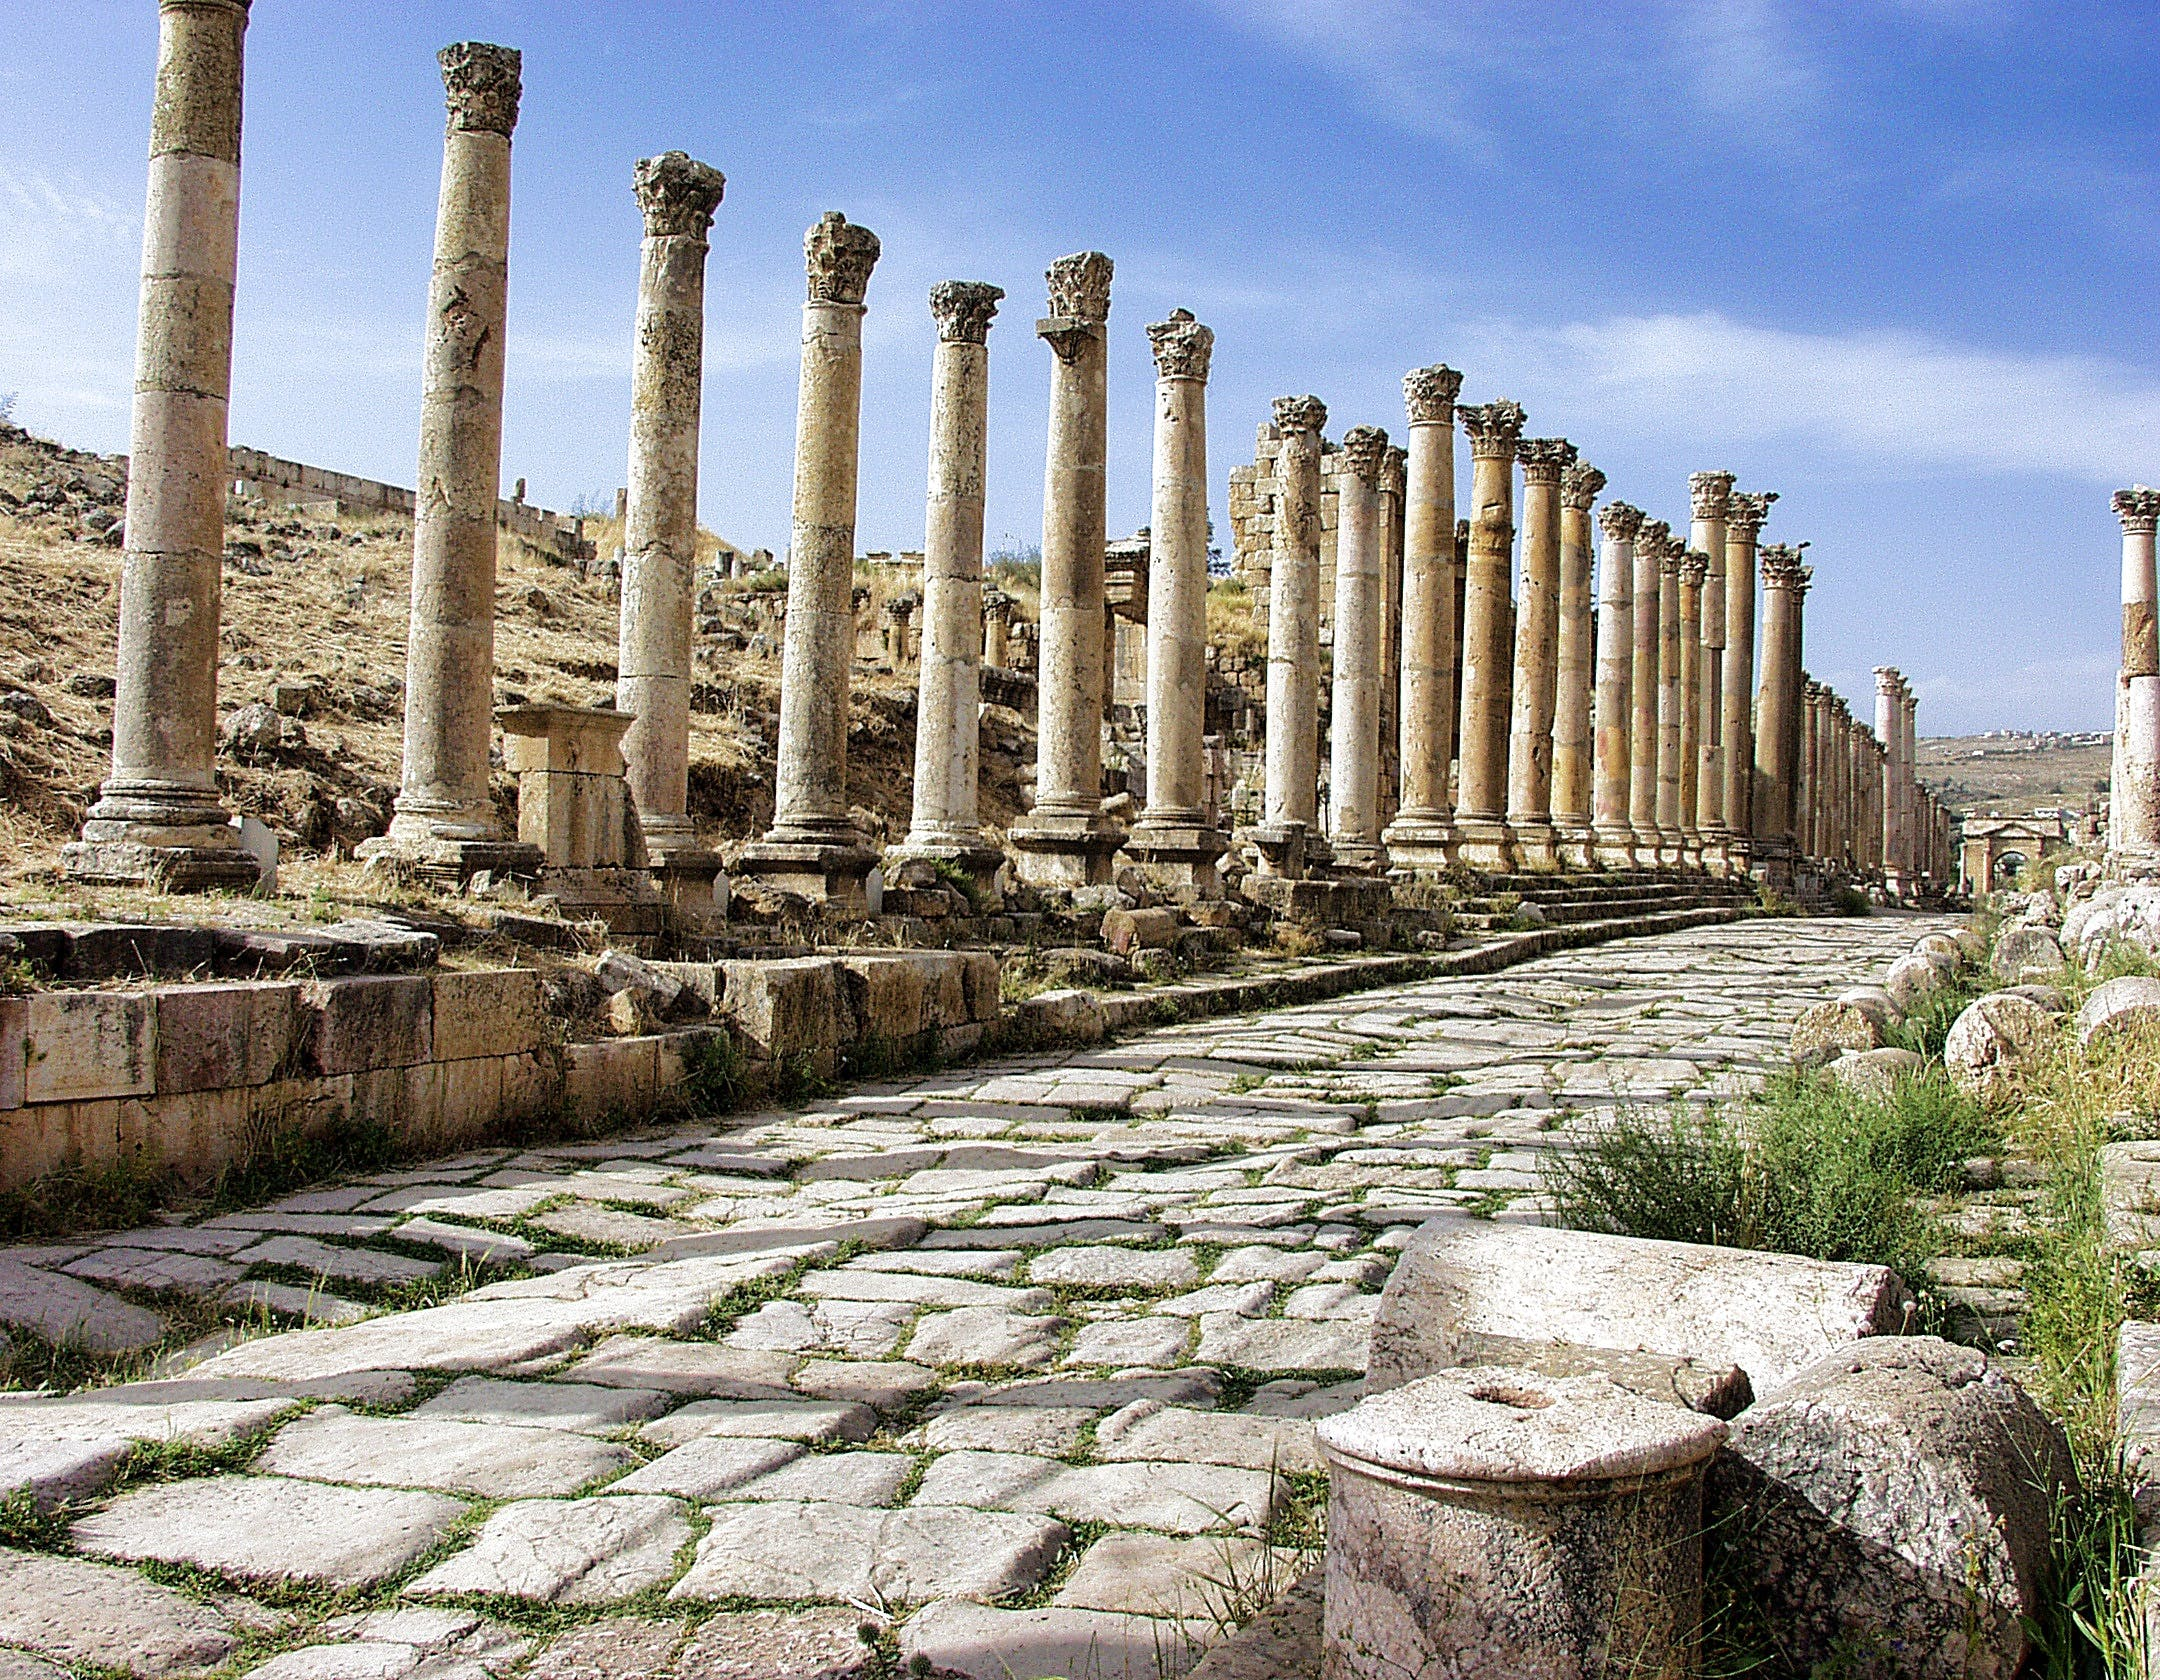 Landscape Photography of Columns